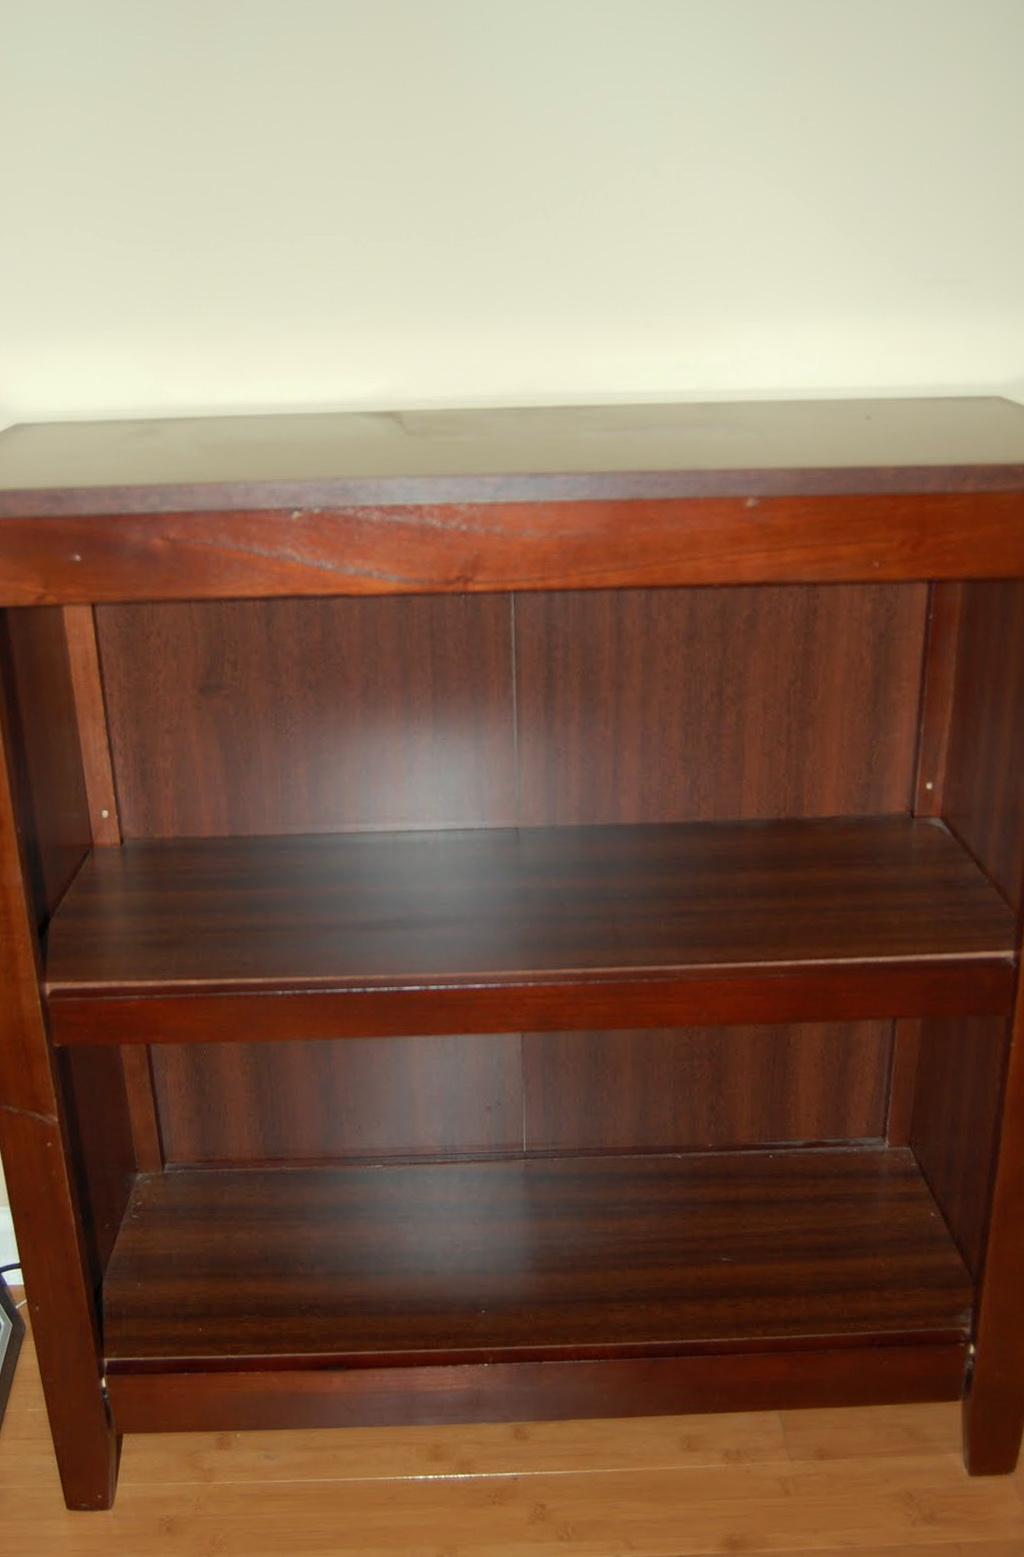 2 Shelf Bookcase Target